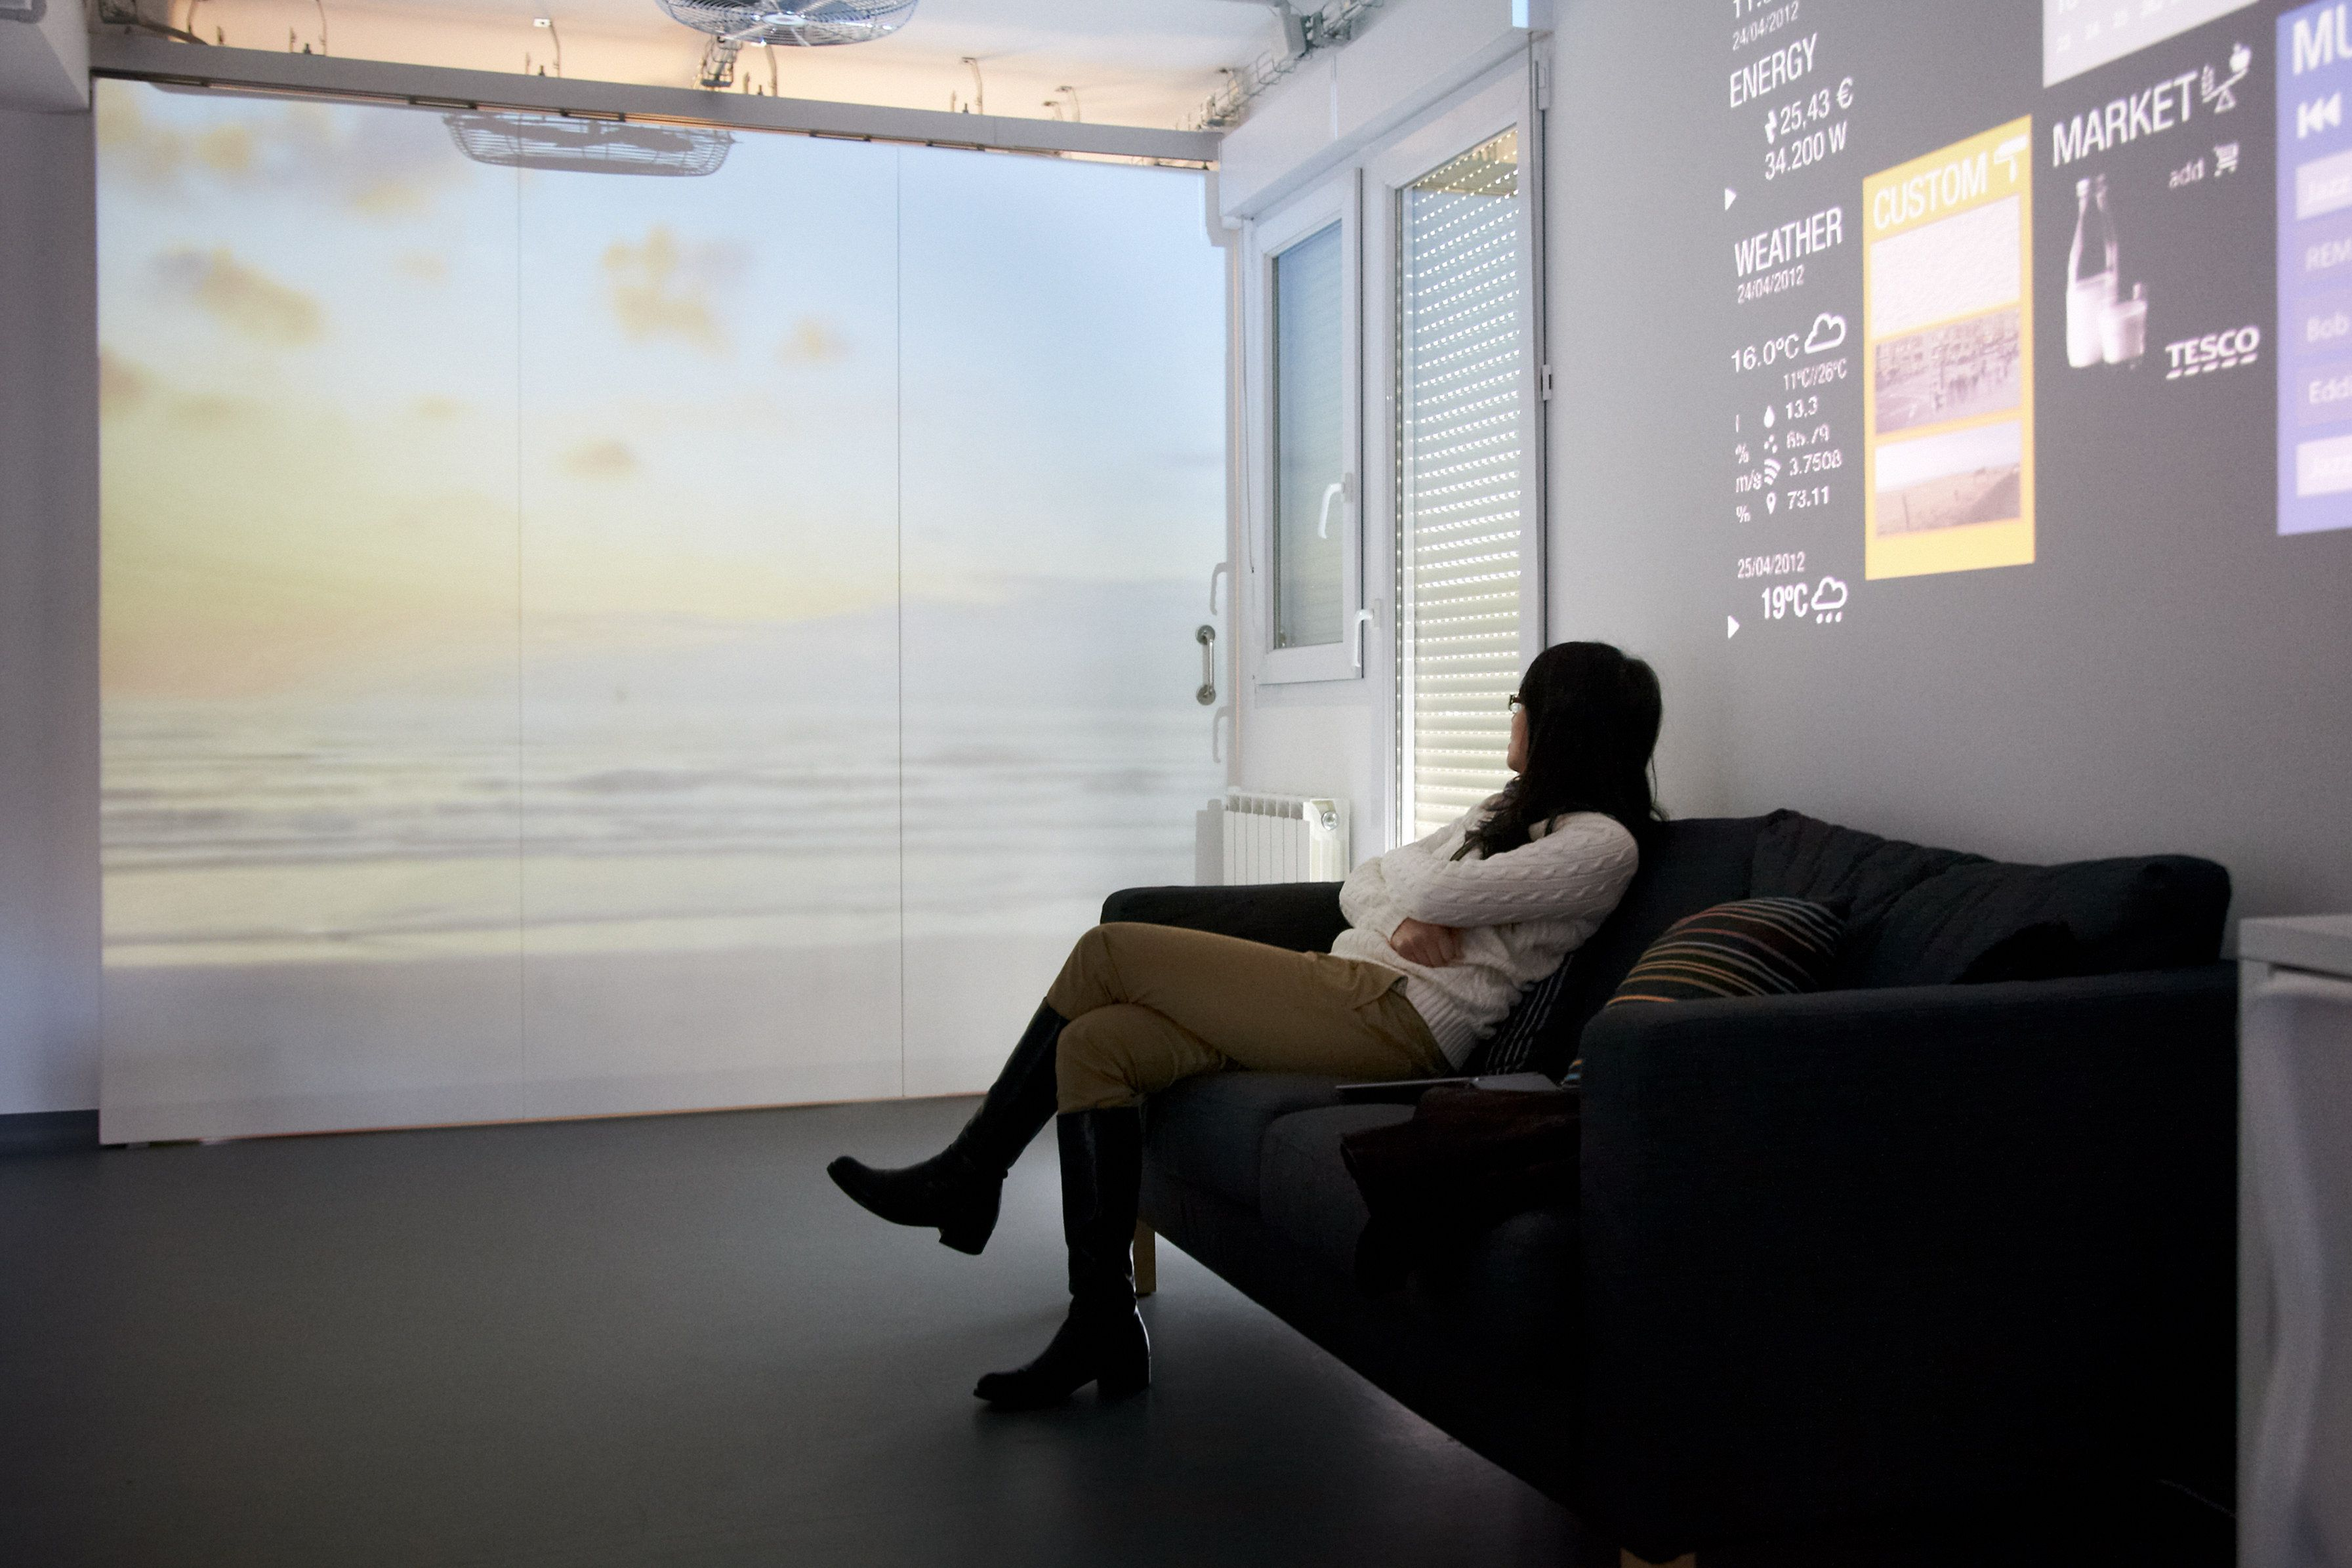 gorgeous 10 future interior house design ideas for inspiration rh pinterest com